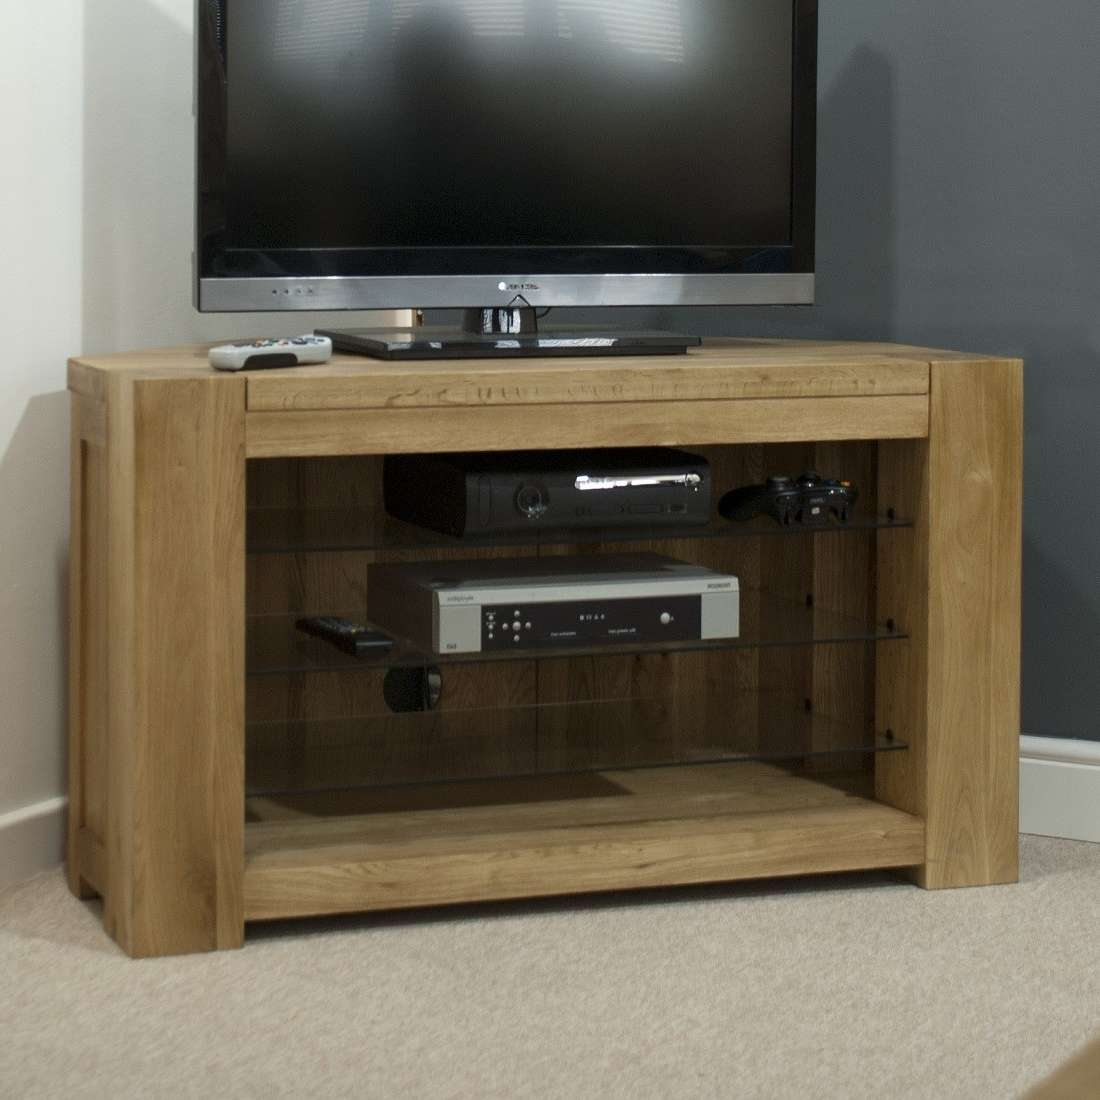 Trend Solid Oak Corner Tv Unit   Oak Furniture Uk For Oak Tv Stands (View 6 of 15)